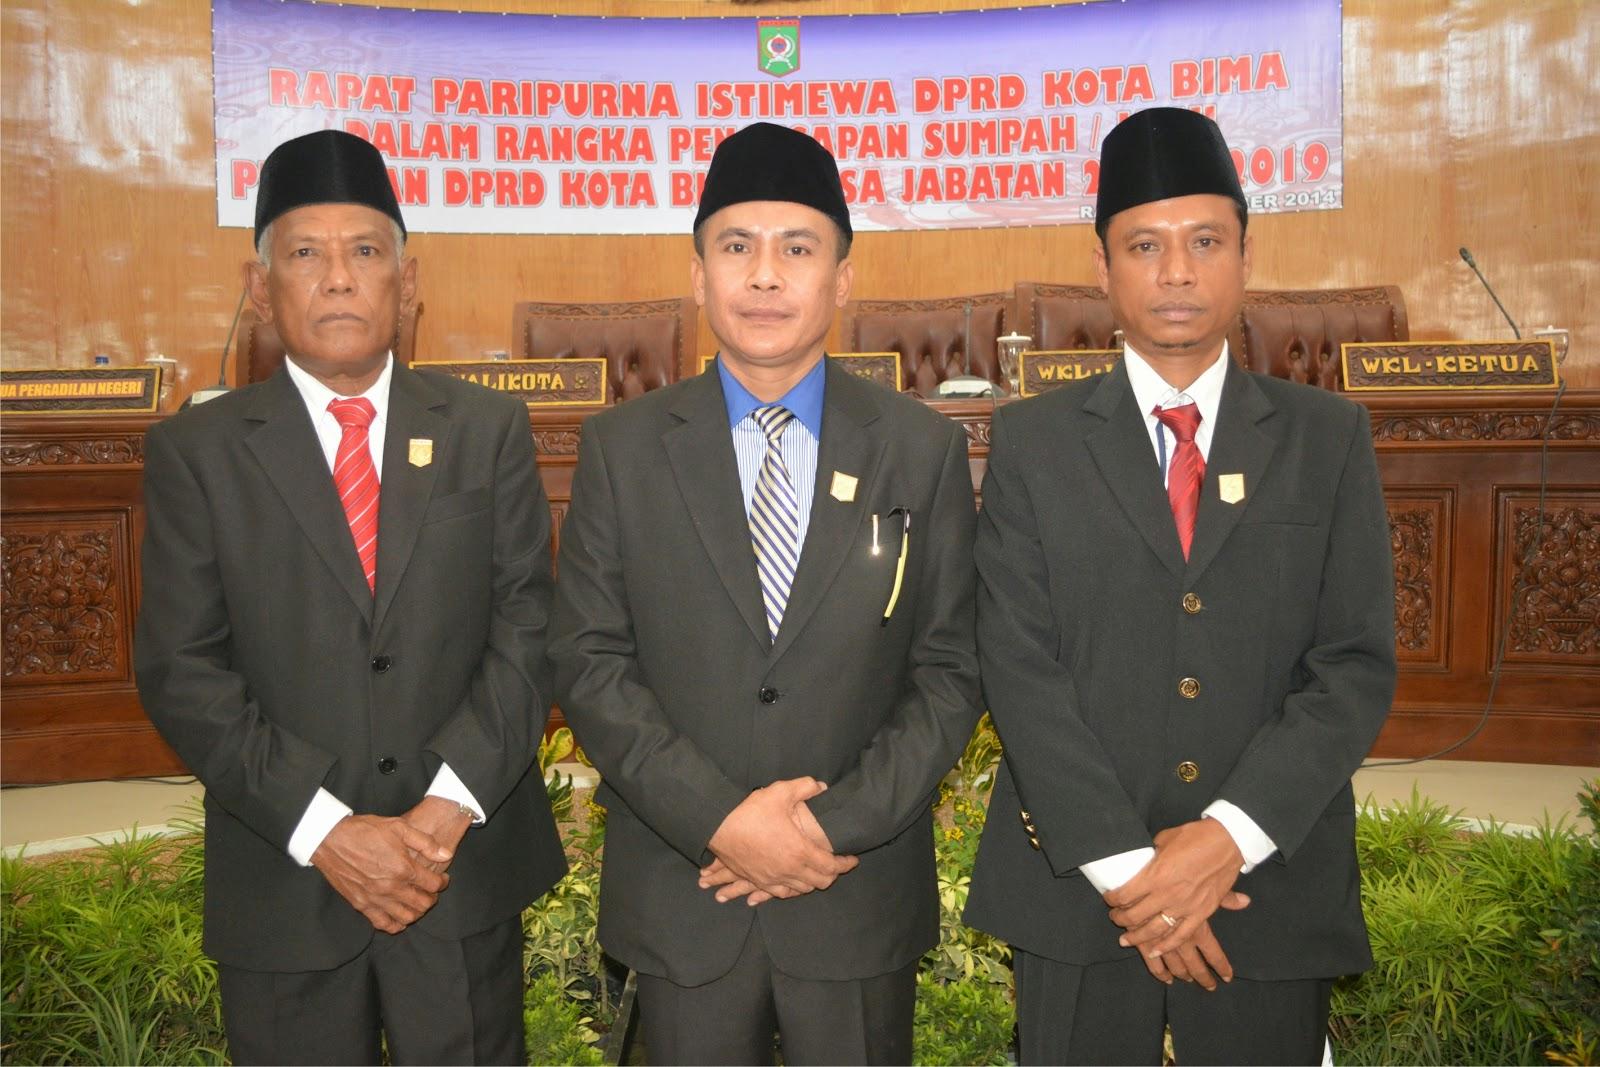 Tujuh Fraksi DPRD Kota Bima Setujui Tiga Raperda